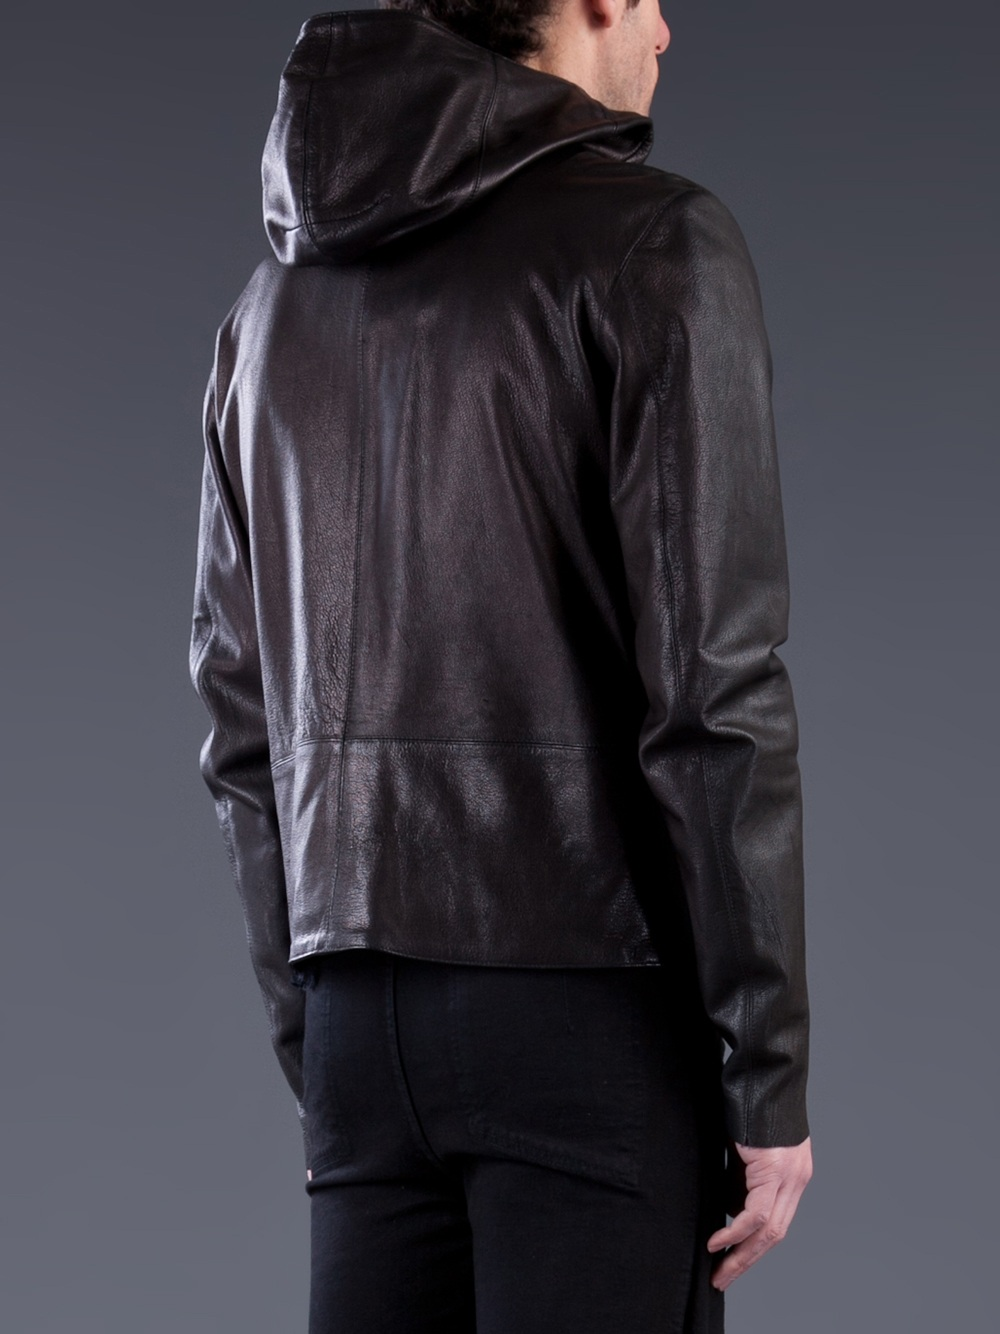 Related: kawasaki ninja jacket kawasaki jacket ninja hoodie kawasaki ninja motorcycle jacket ninja pants. Include description. Categories. Selected category All. Plus Size Men Hooded Coat Jacket long cardigan black ninja gothic punk hoodie J7. Unbranded. $ Buy It Now. Free Shipping.